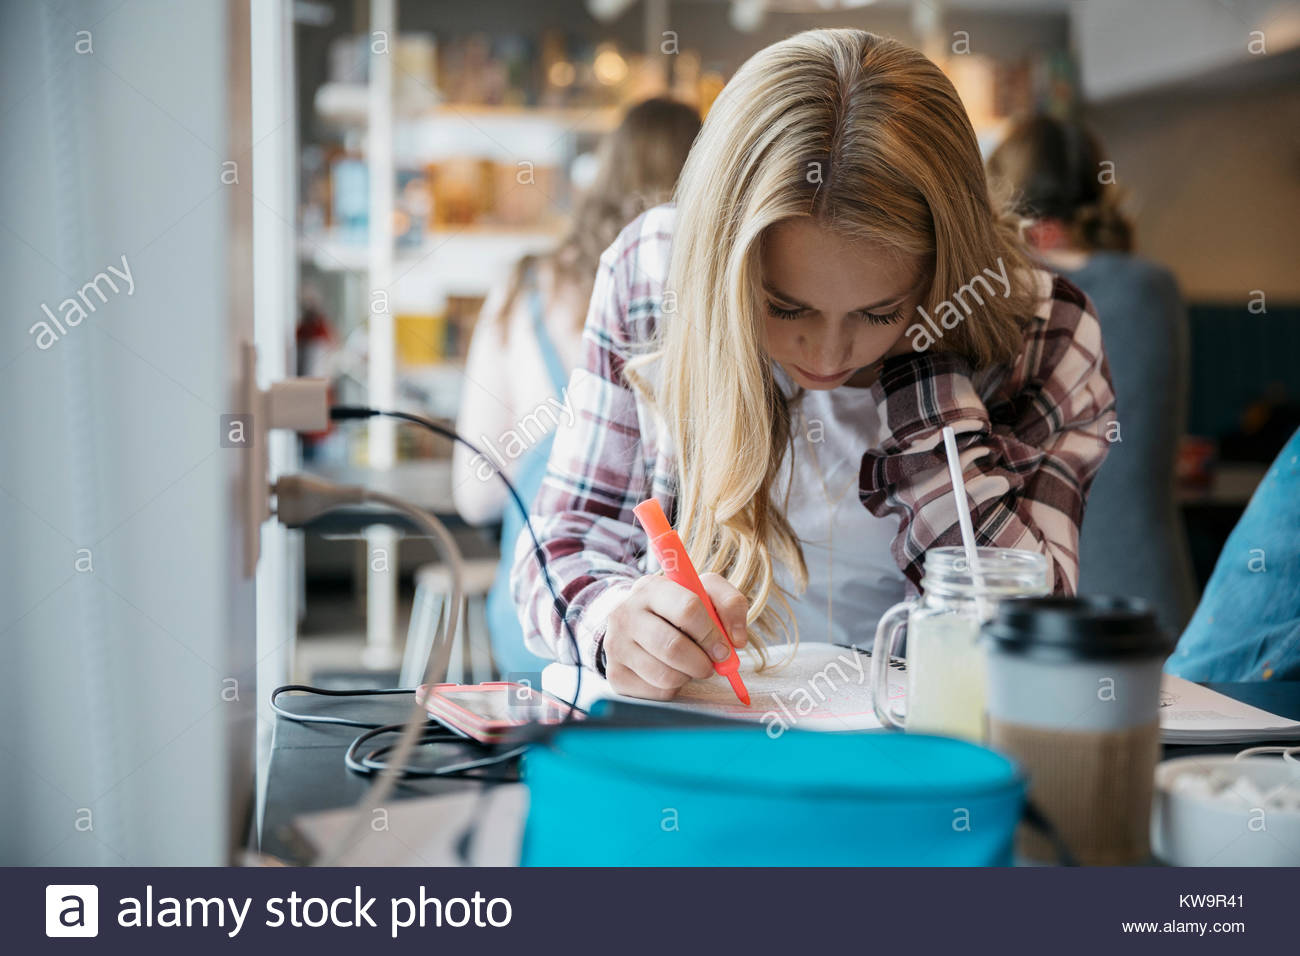 Centrado Caucasian high school girl estudiante en cafe Imagen De Stock